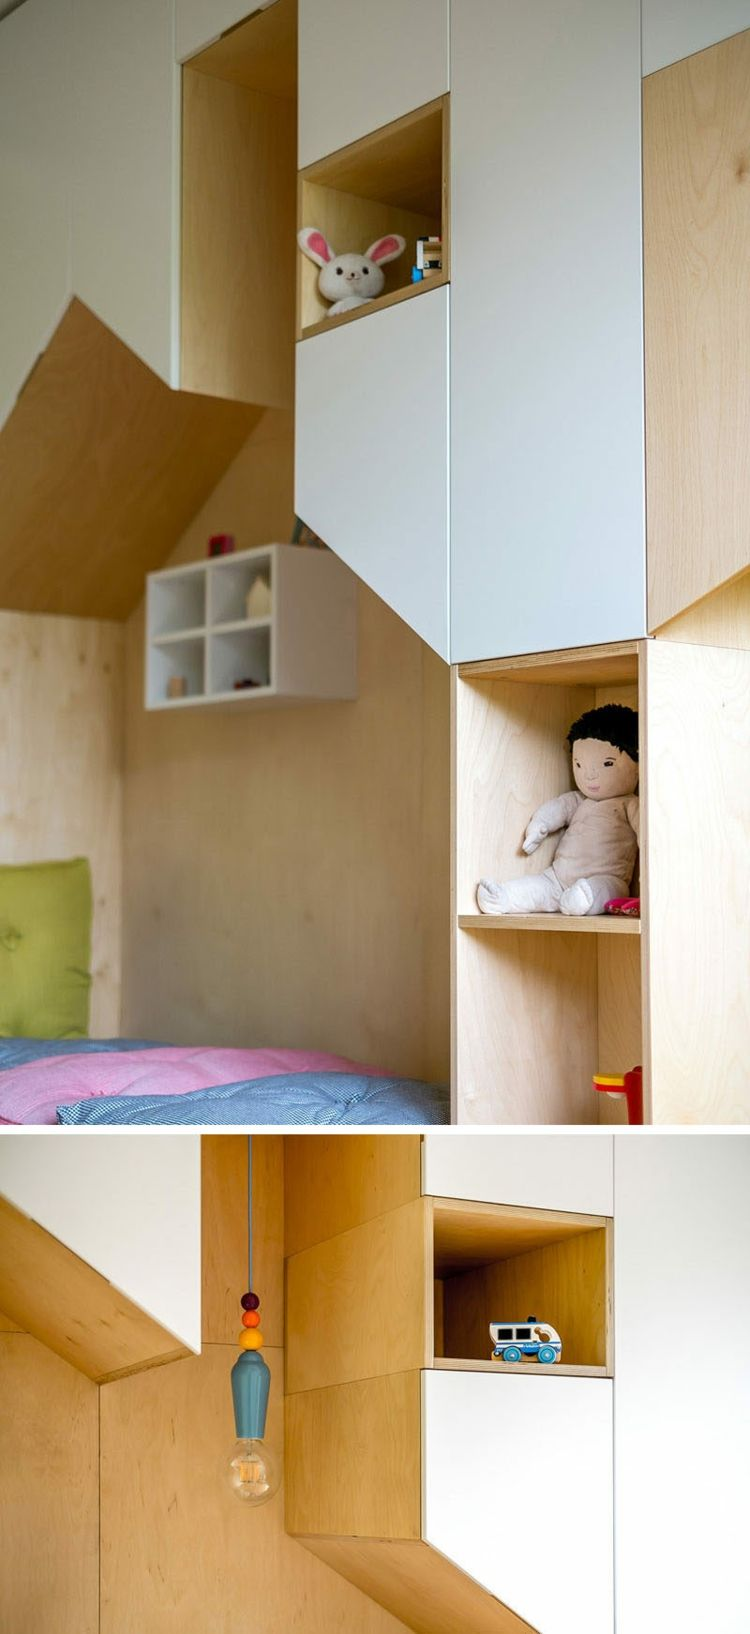 holz-kinderzimmer-pendelleuchte-mdf-matt-3 | chambre enfants en 2018